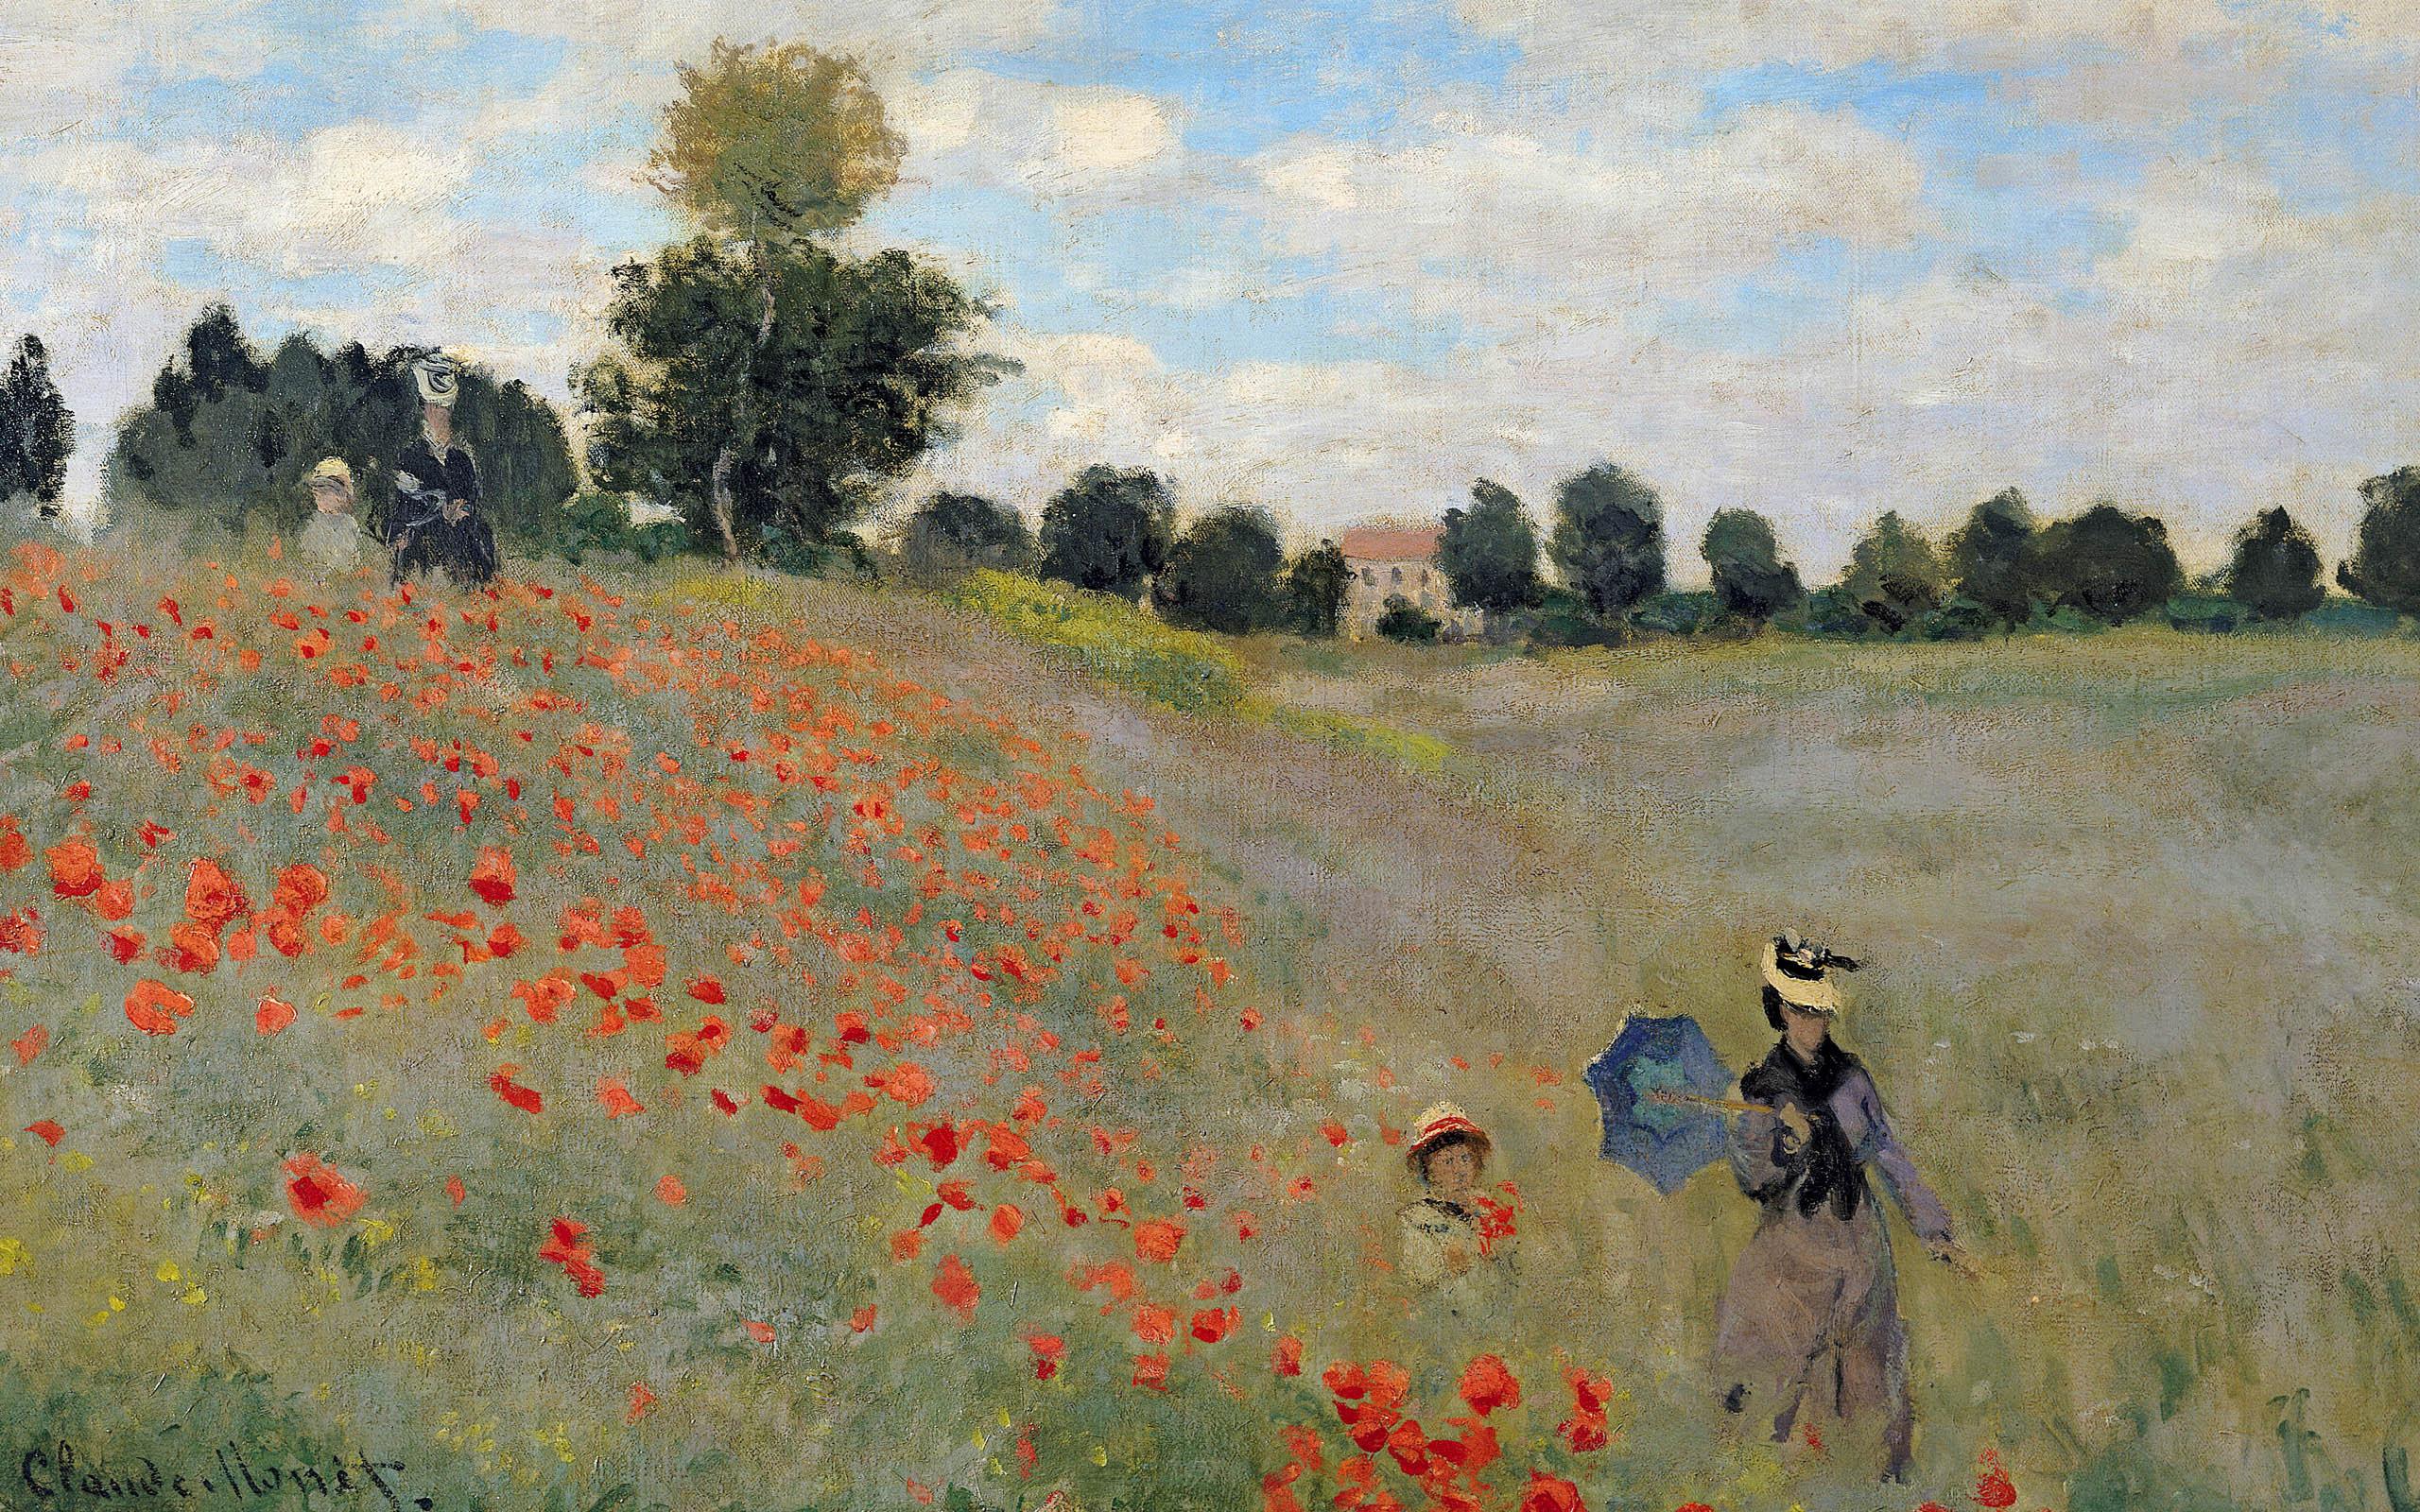 identifying an Impressionist painting   impressionism Ask MetaFilter 2560x1600